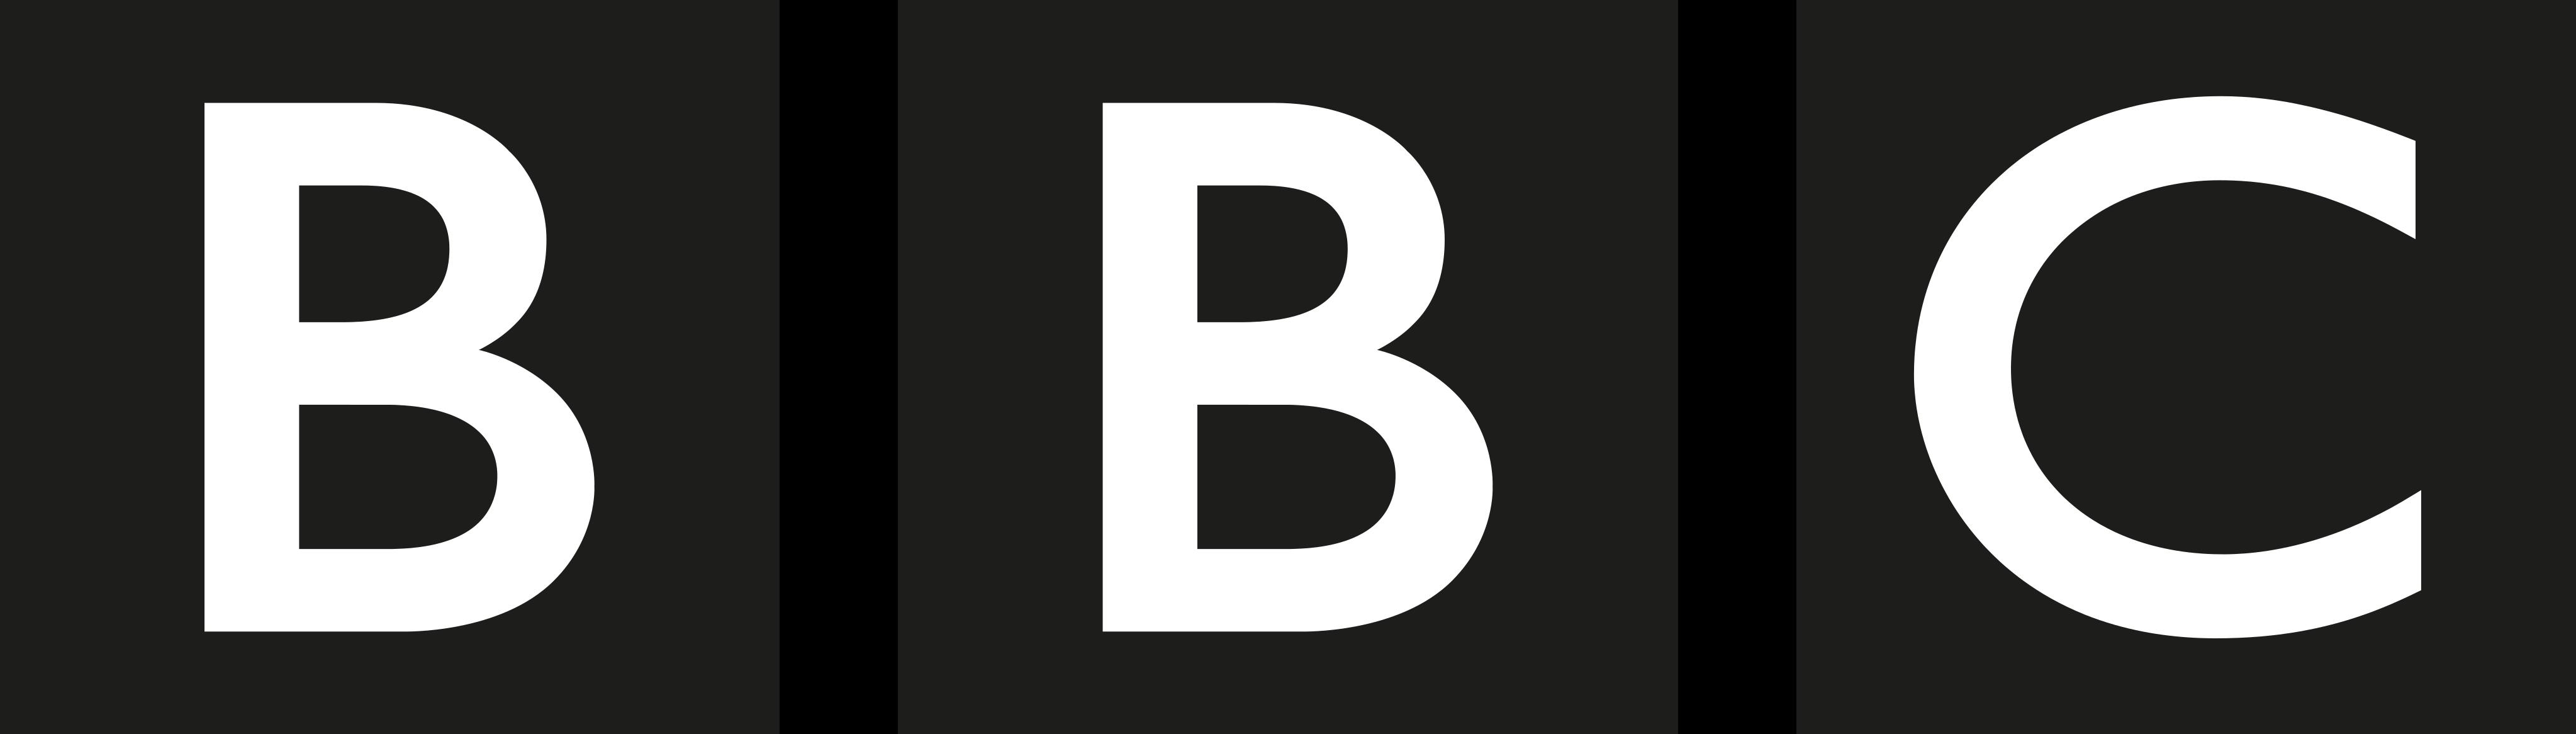 bbc logo - BBC Logo